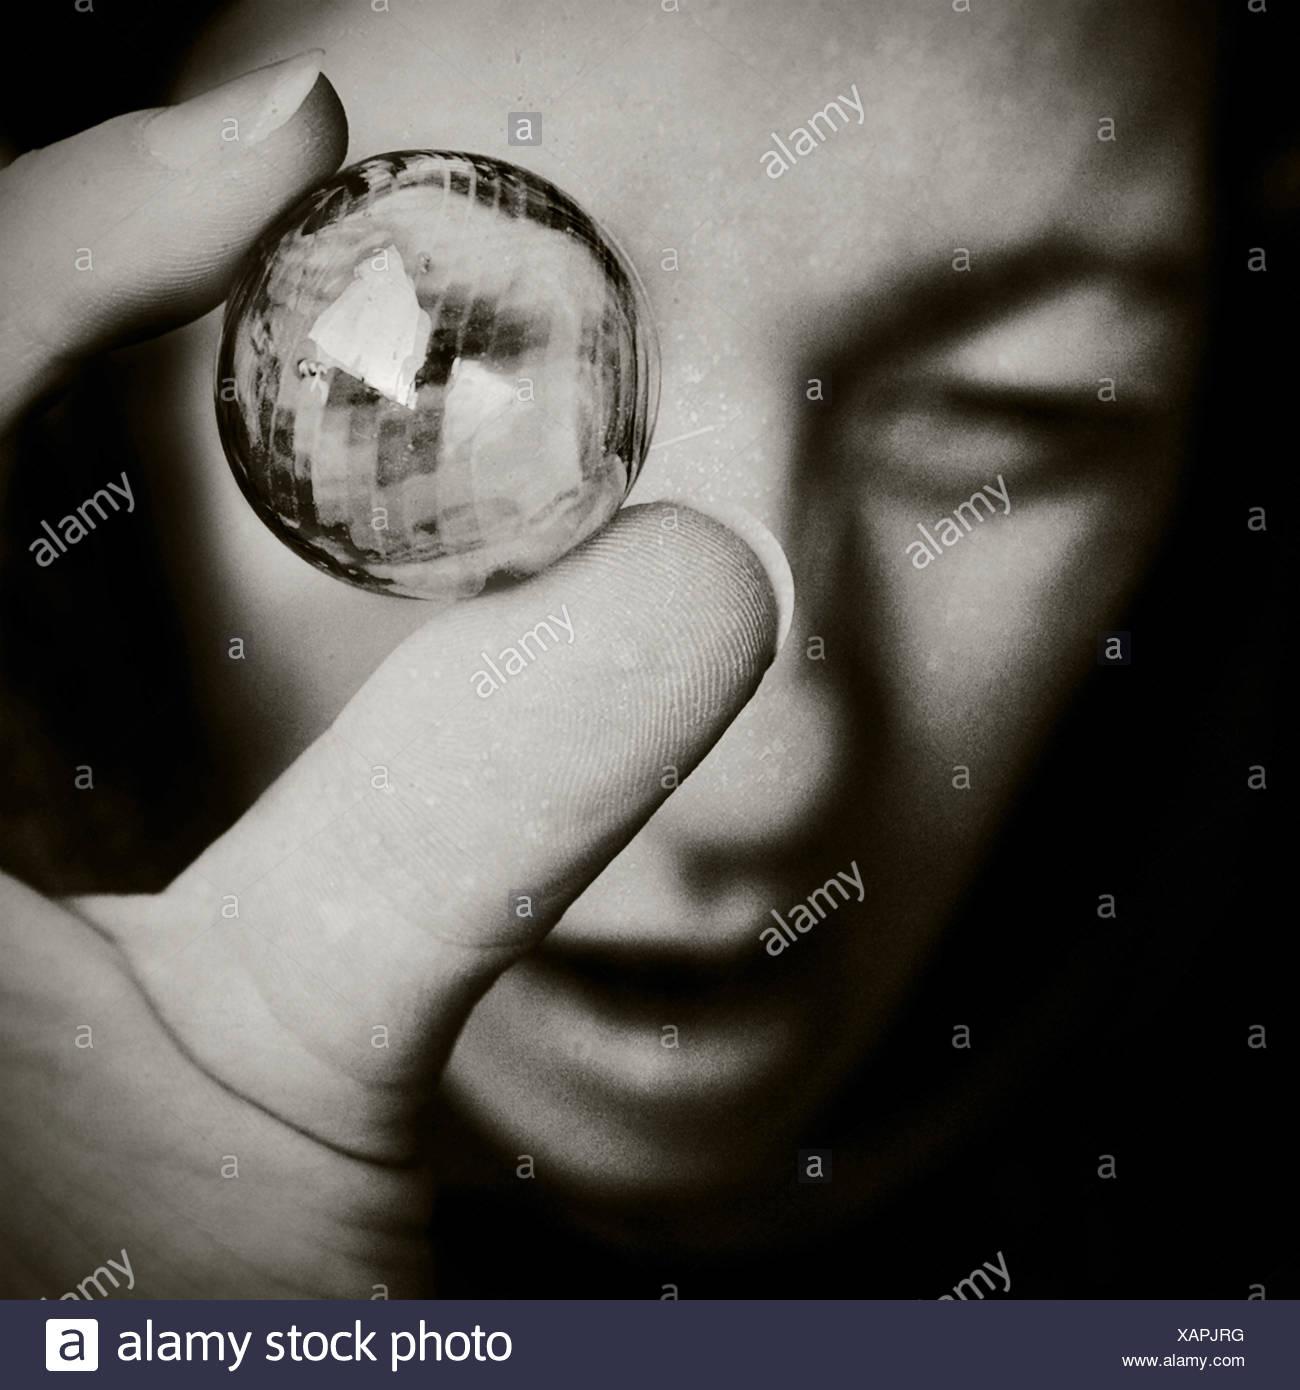 Nahaufnahme eines Mädchens hält eine Glasperle Stockbild